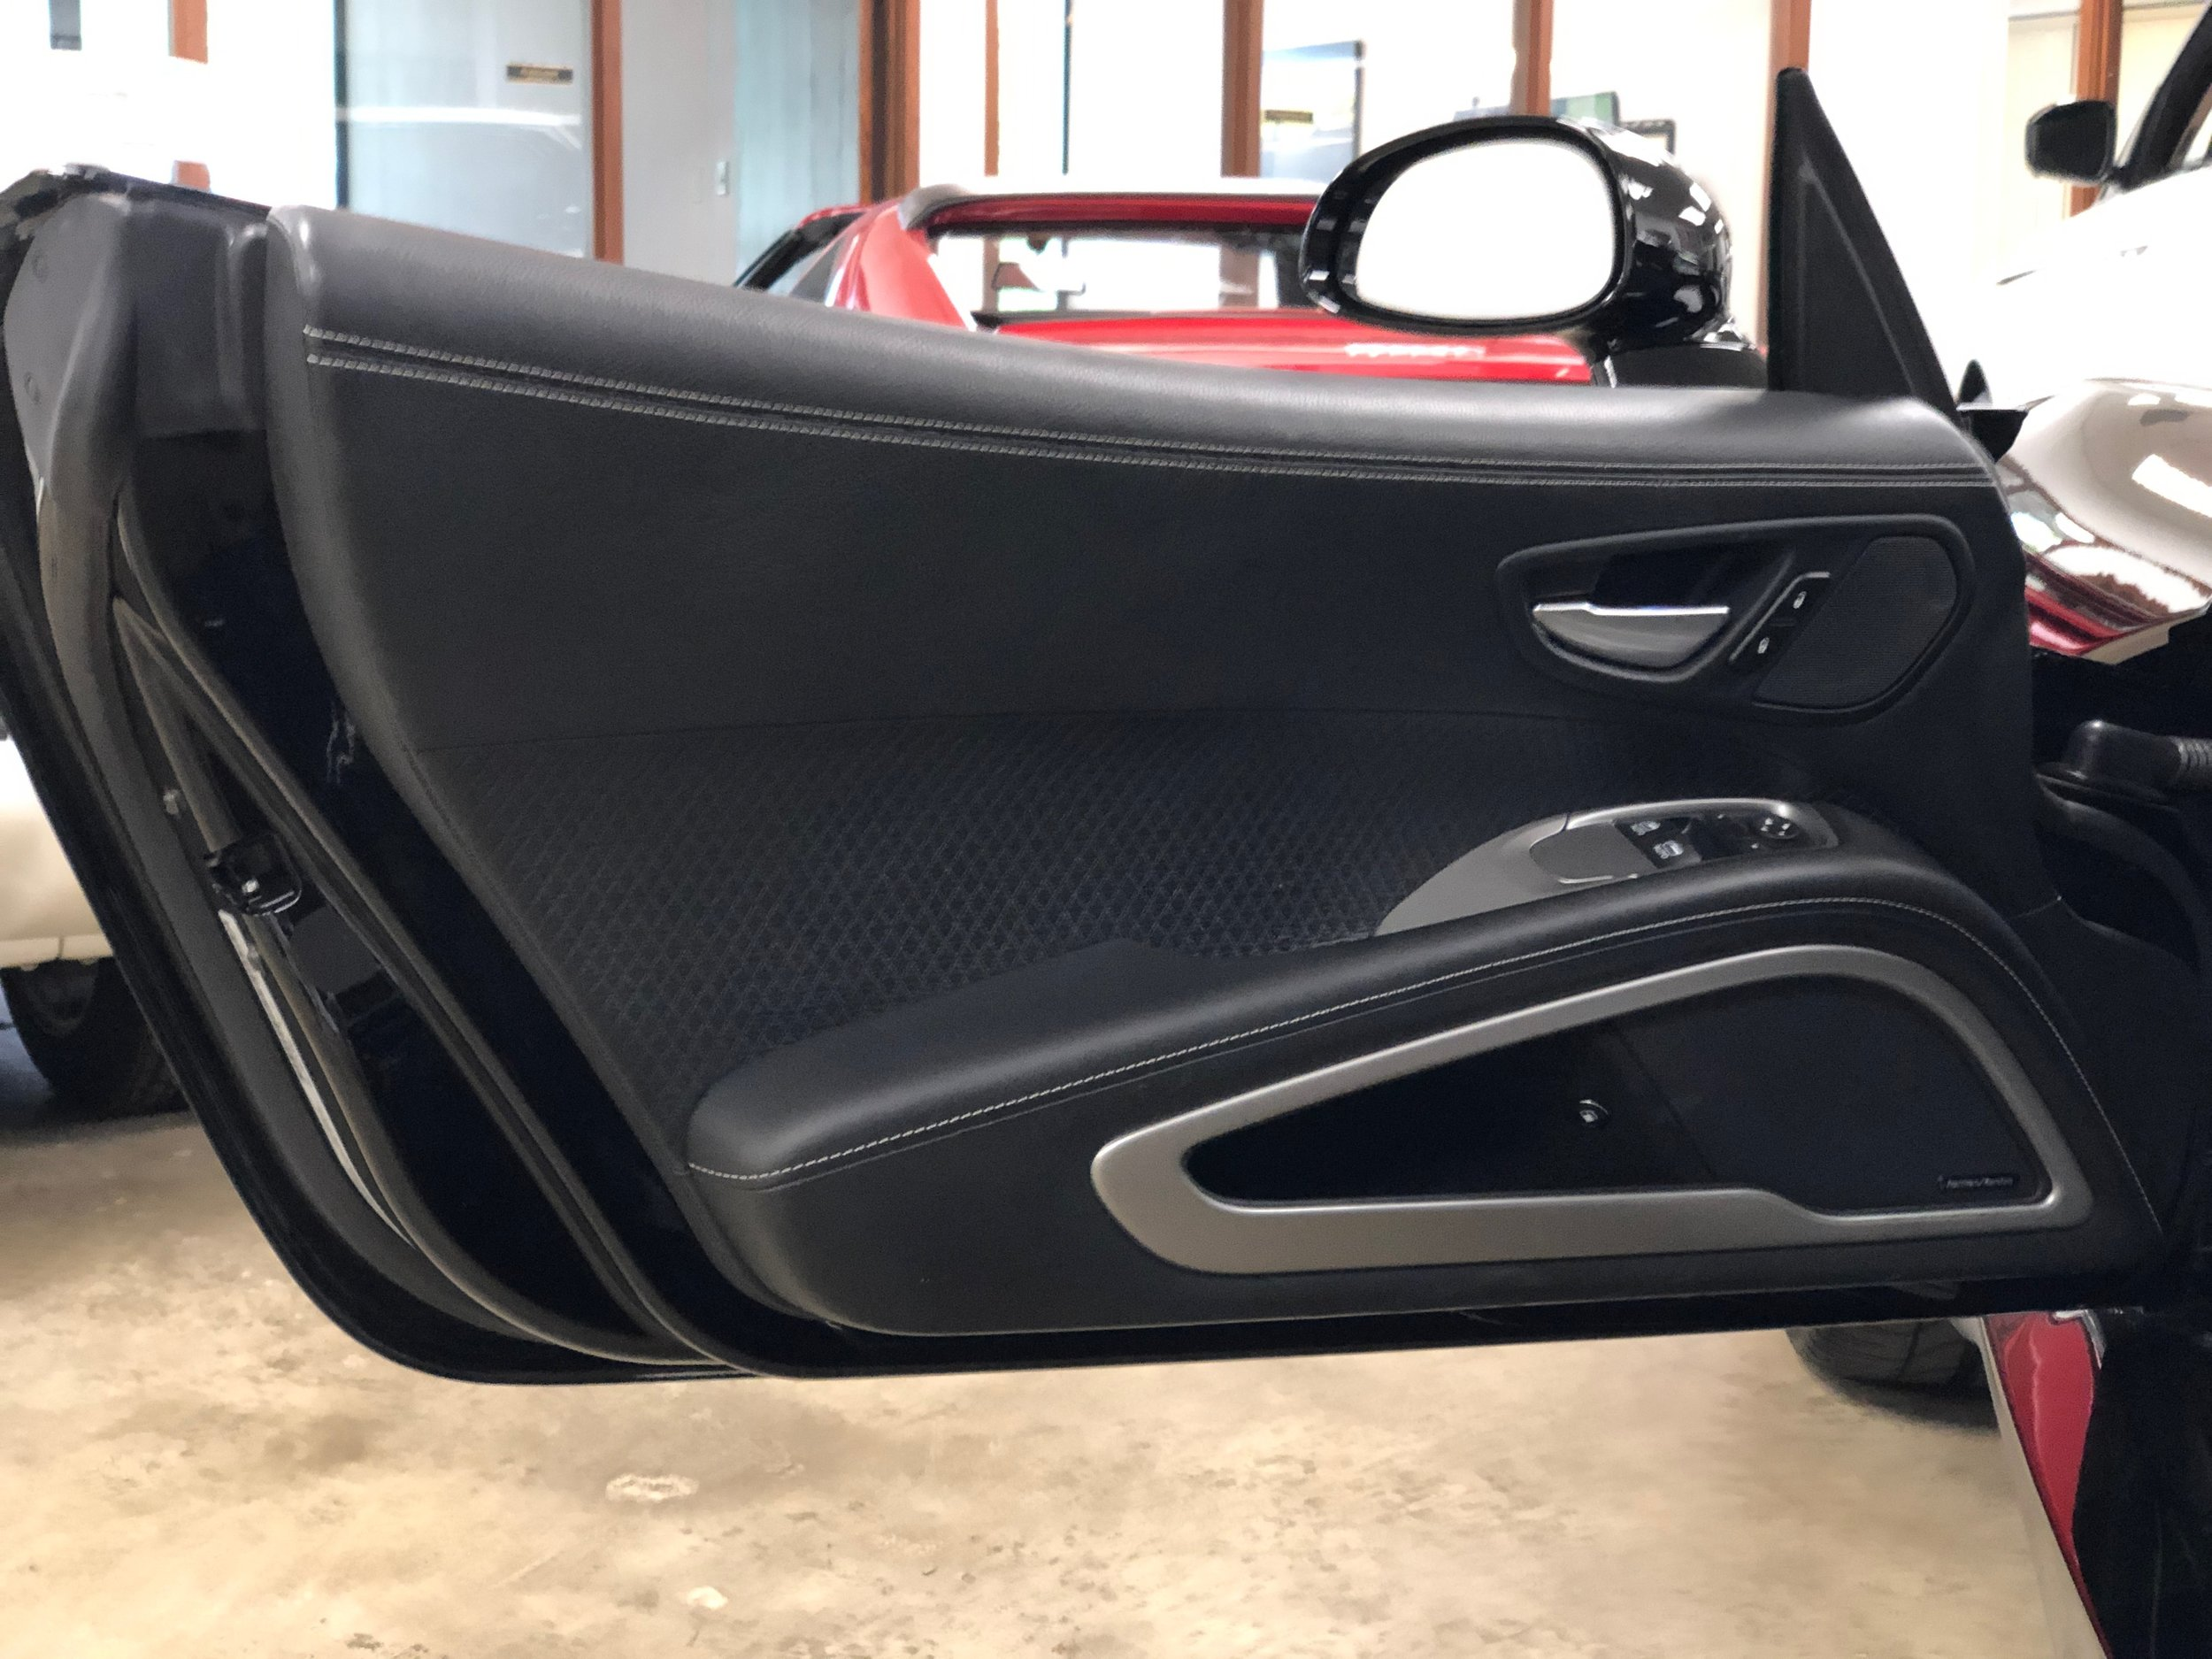 2014 Dodge Viper GTS  Door